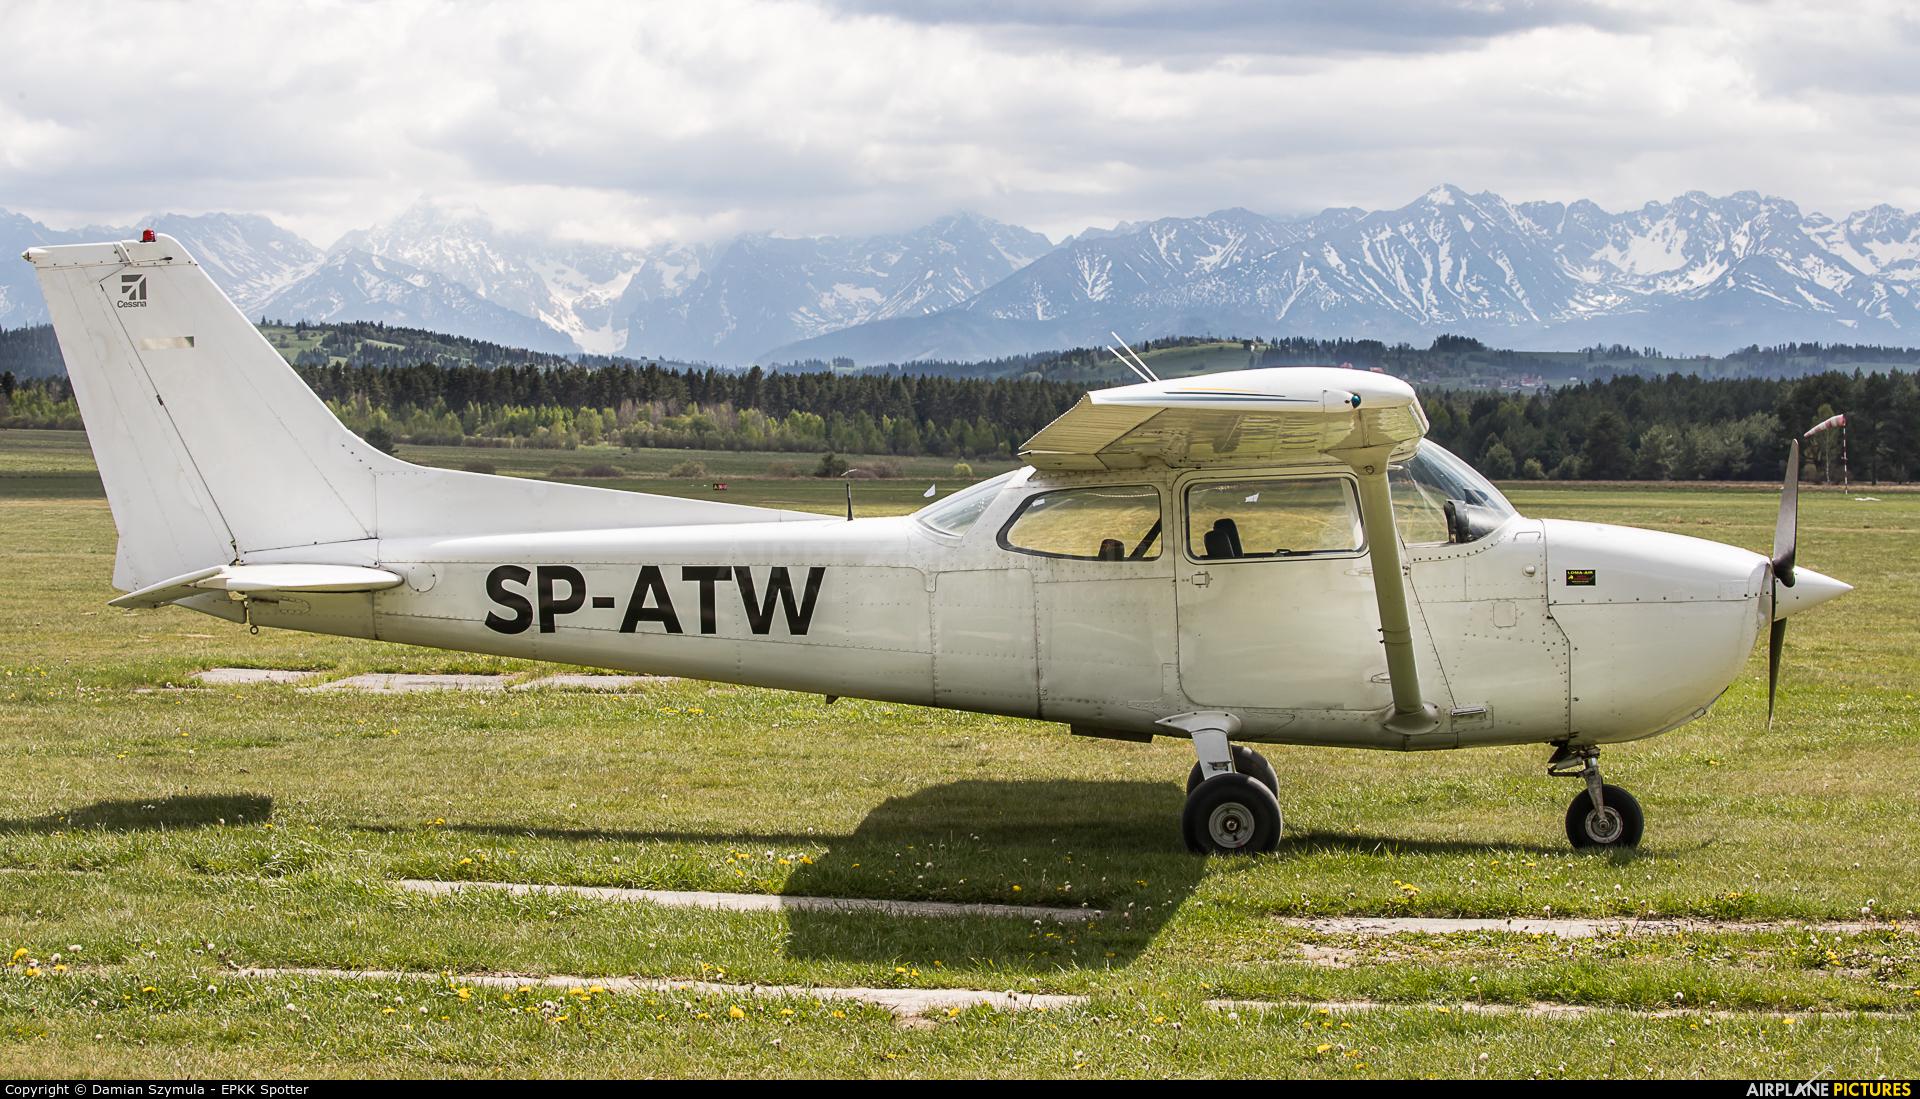 Aeroklub Nowy Targ SP-ATW aircraft at Nowy Targ Airport